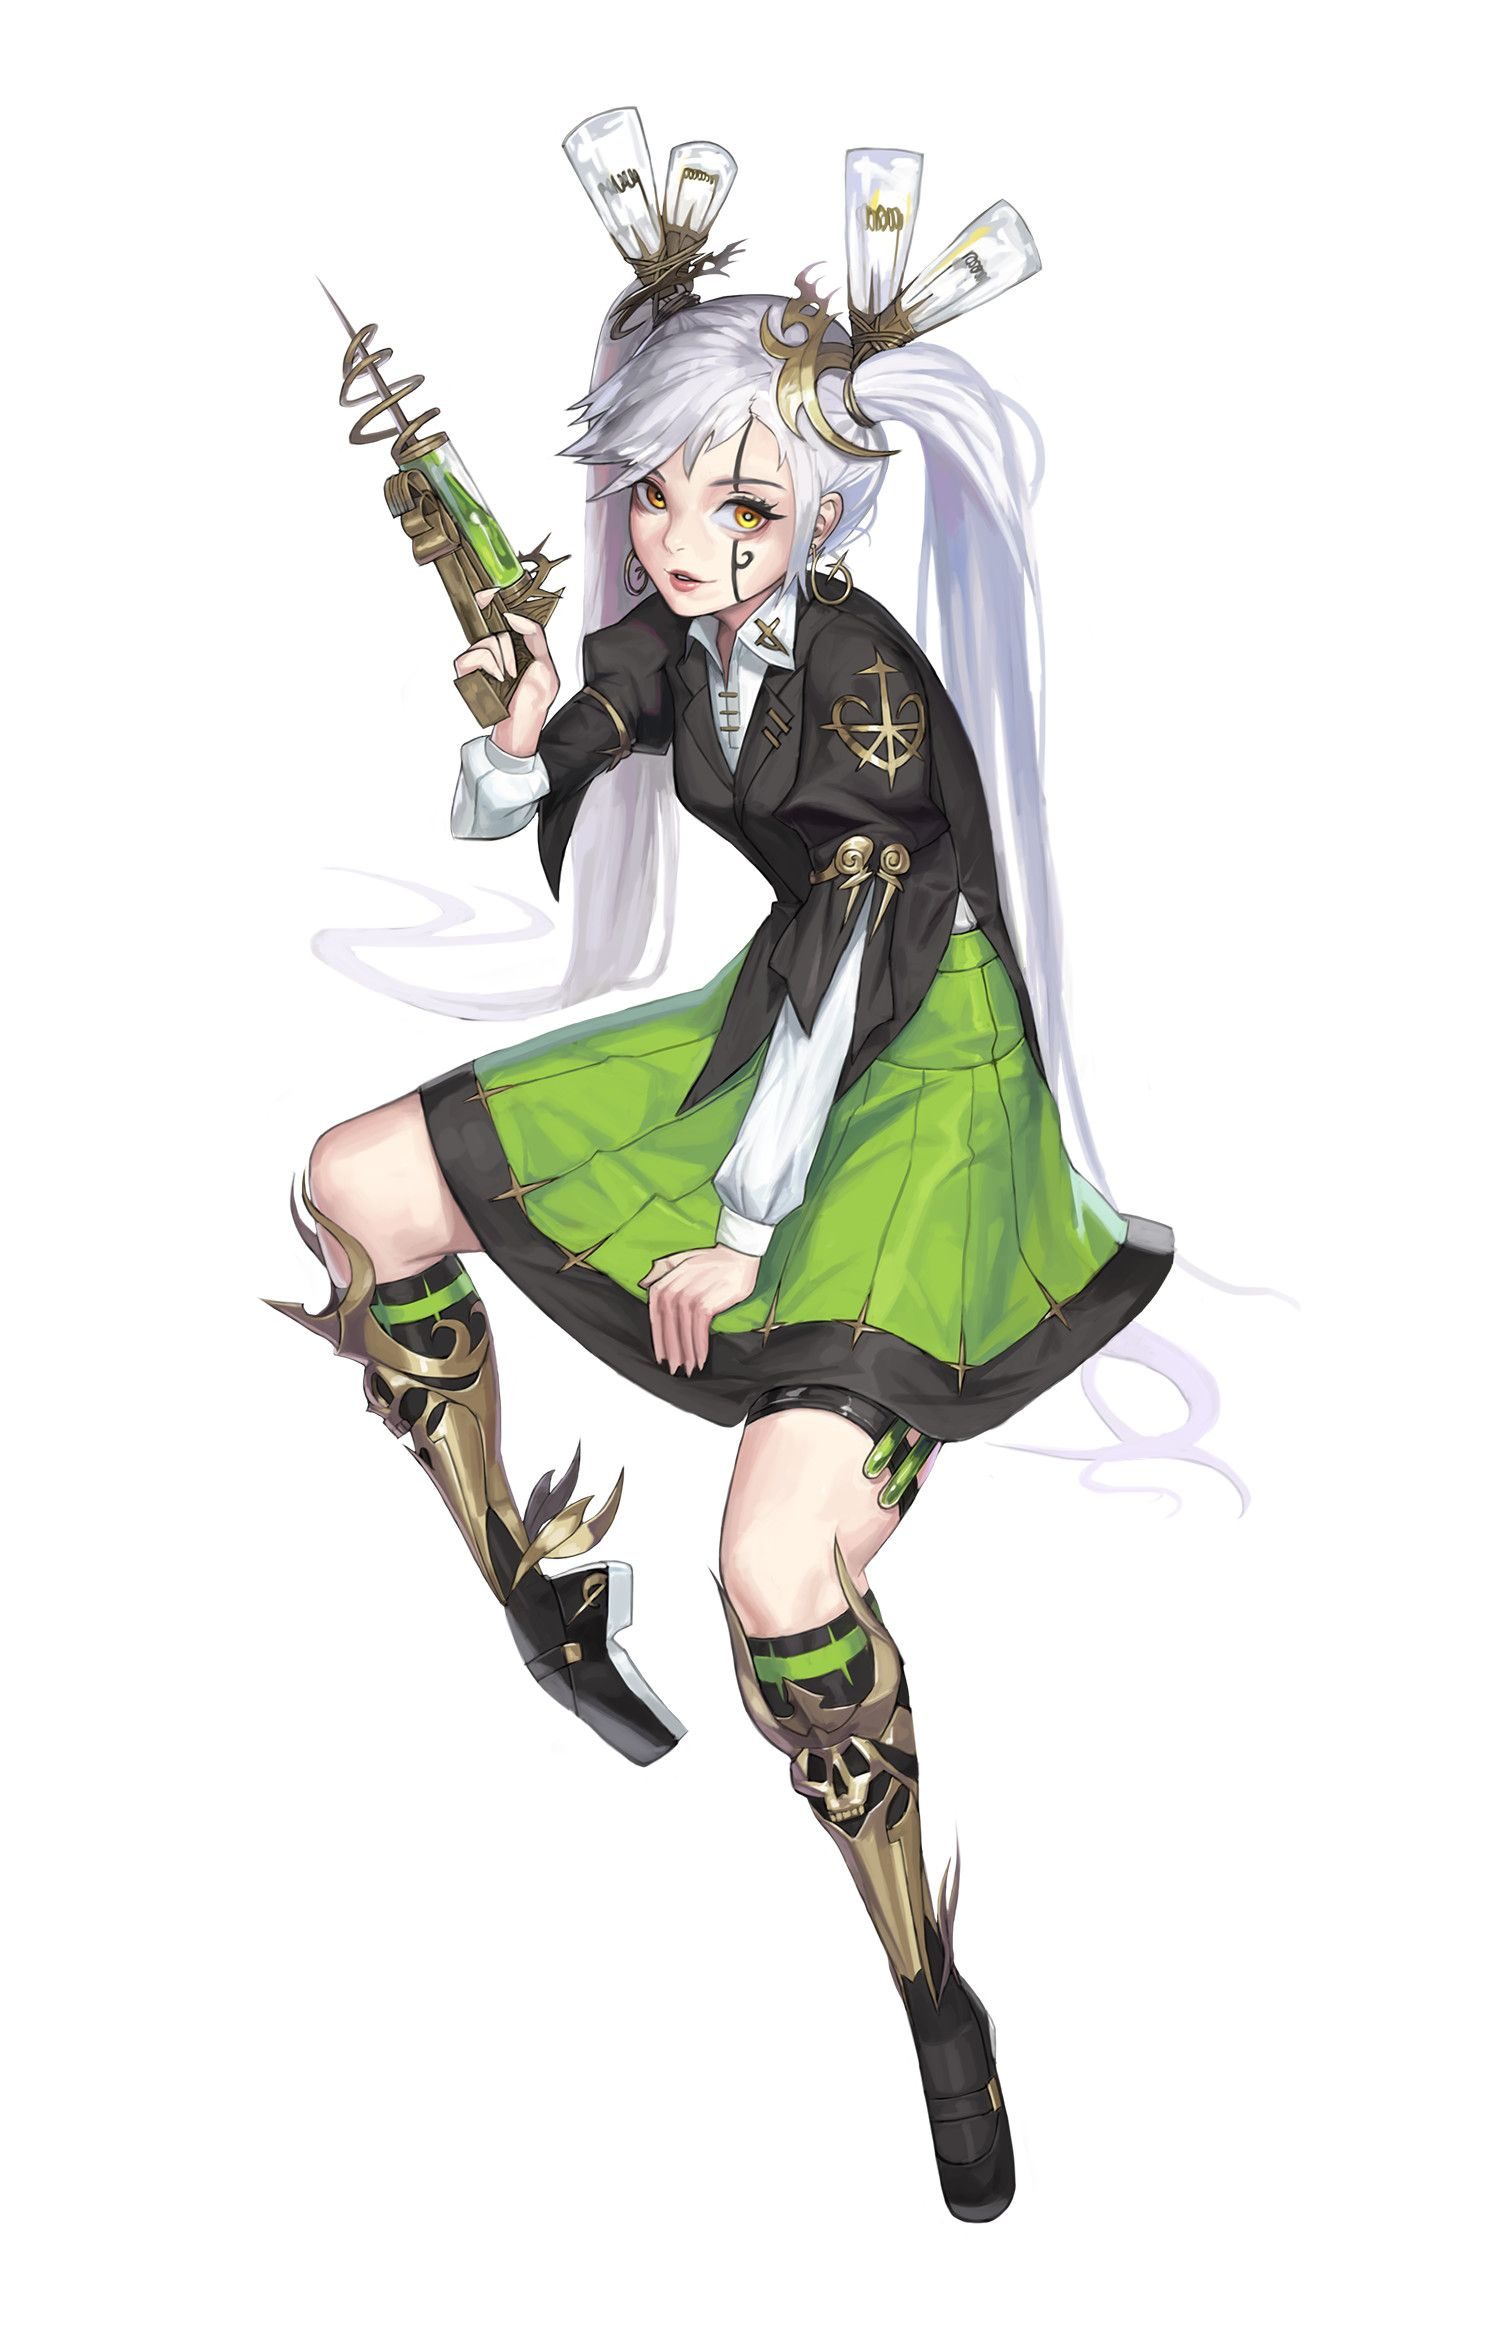 Swordsman Cotta Anime Character Design Scientist